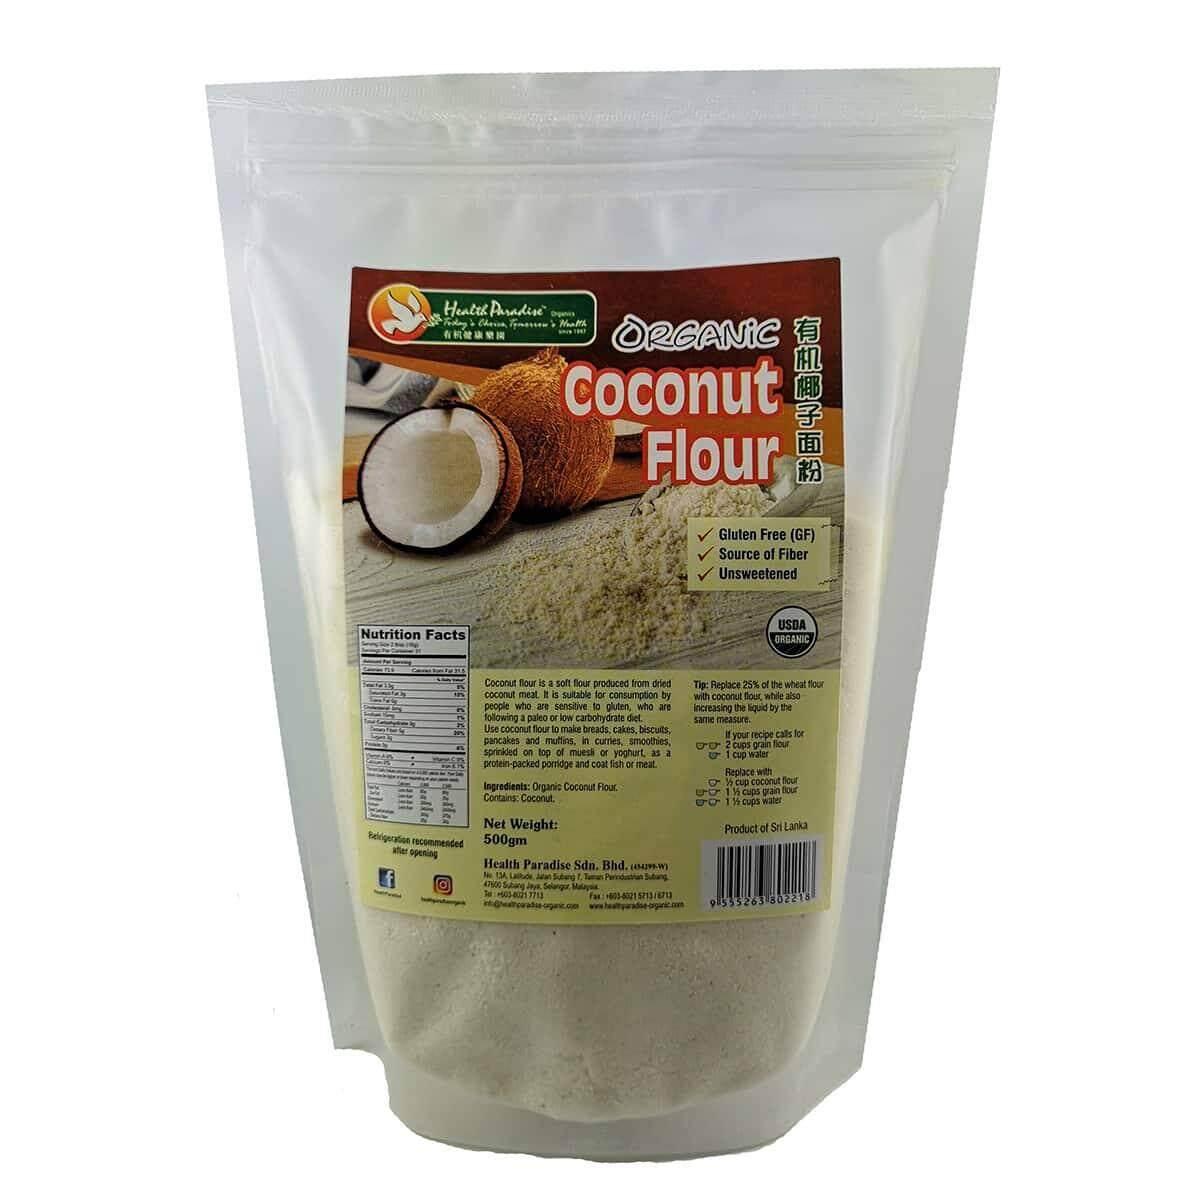 RM10.90Health Paradise Organic Coconut Flour 500gm GF gluten free keto paleo